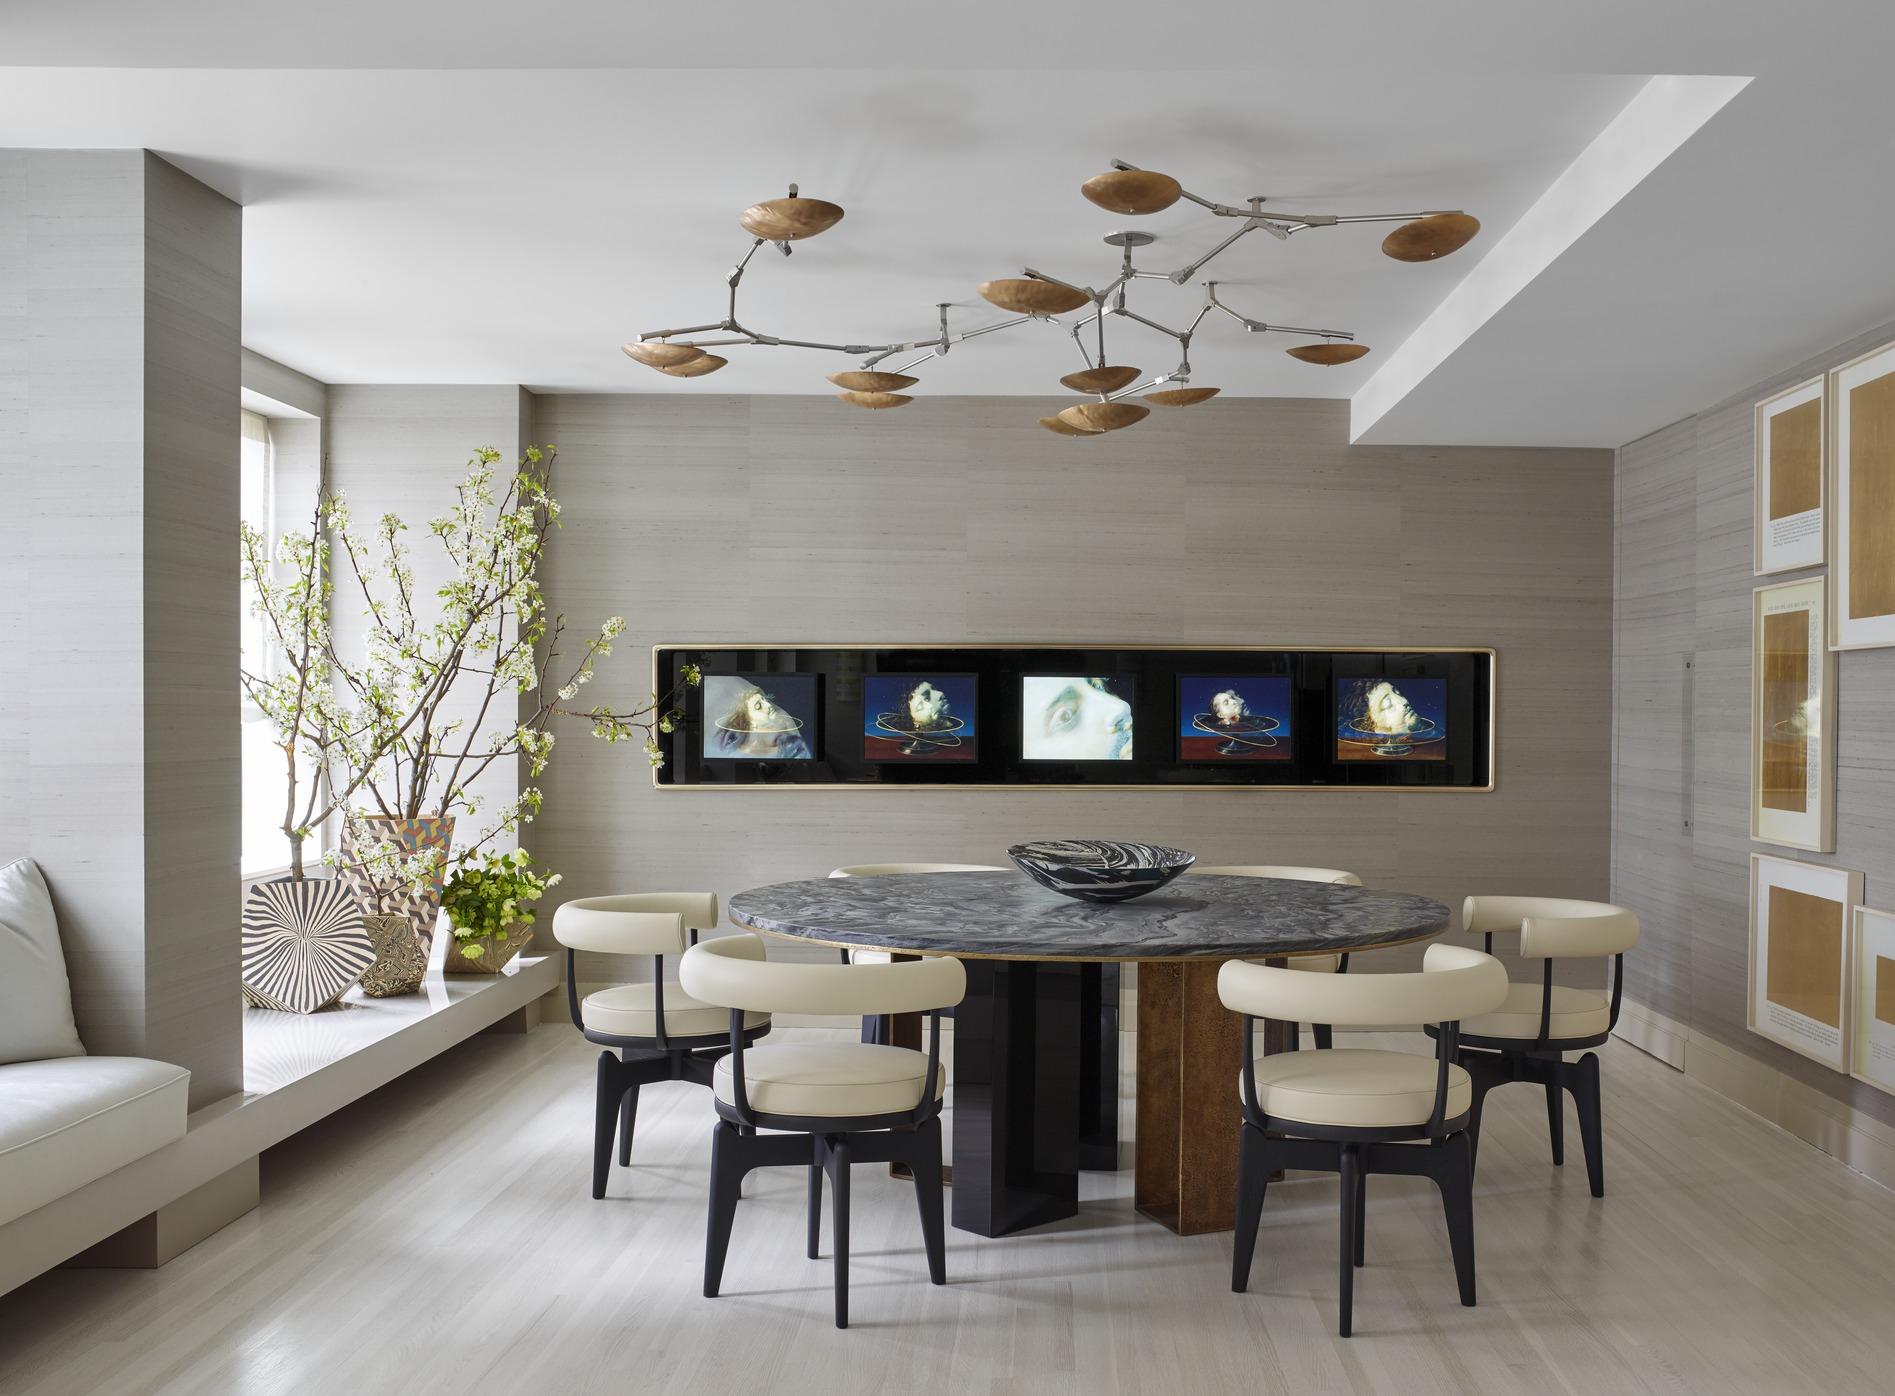 Elegant 25 Modern Dining Room Decorating Ideas - Contemporary Dining Room Furniture dining room decoration ideas